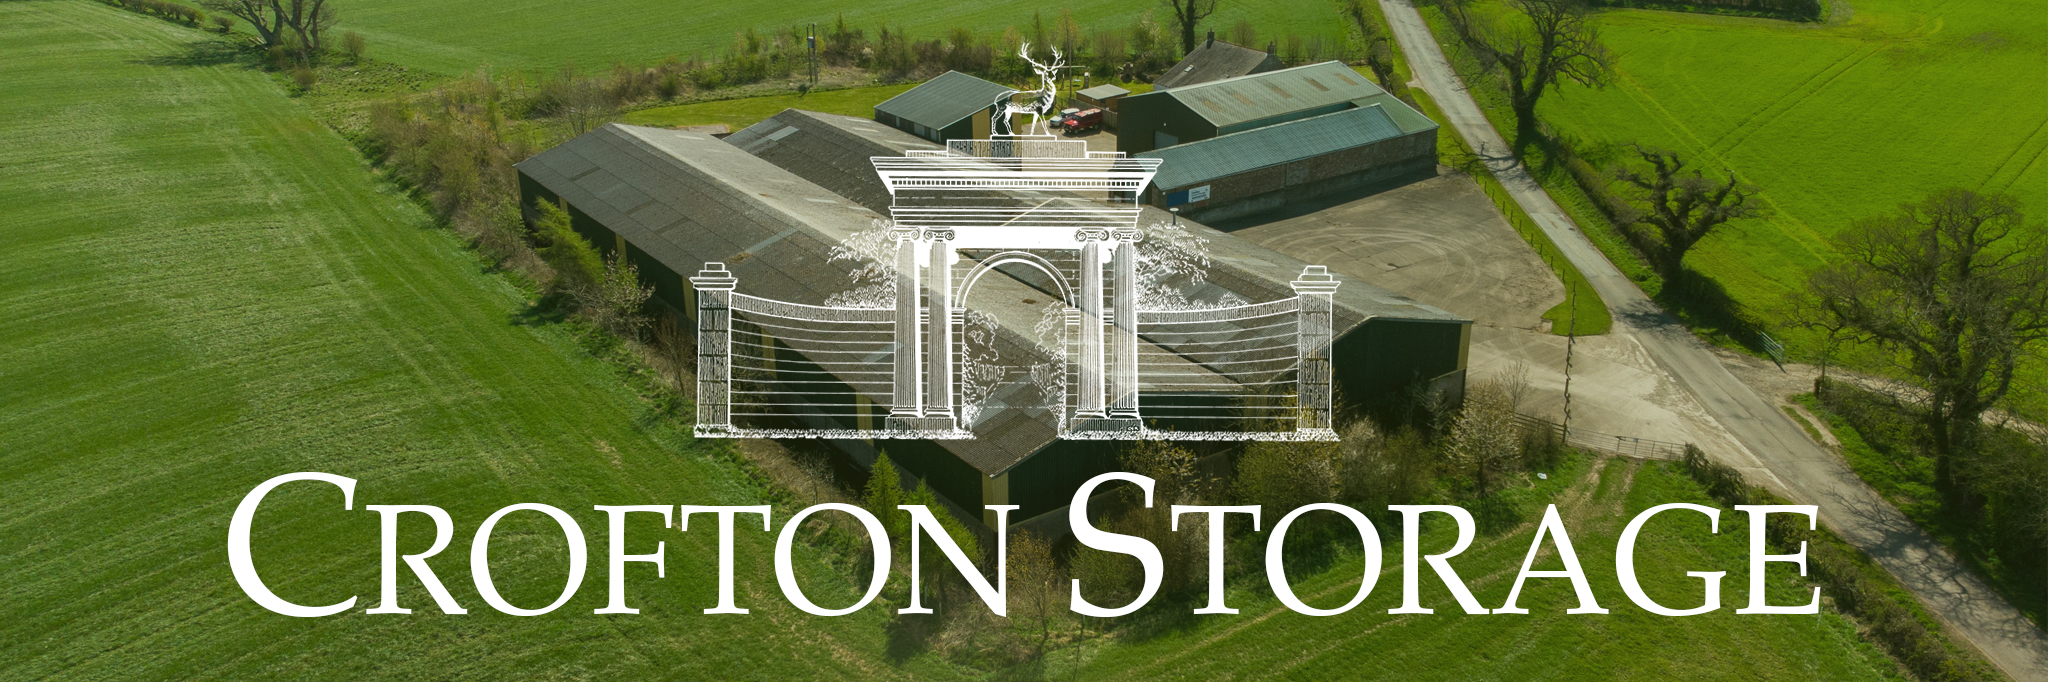 Crofton Caravan Storage